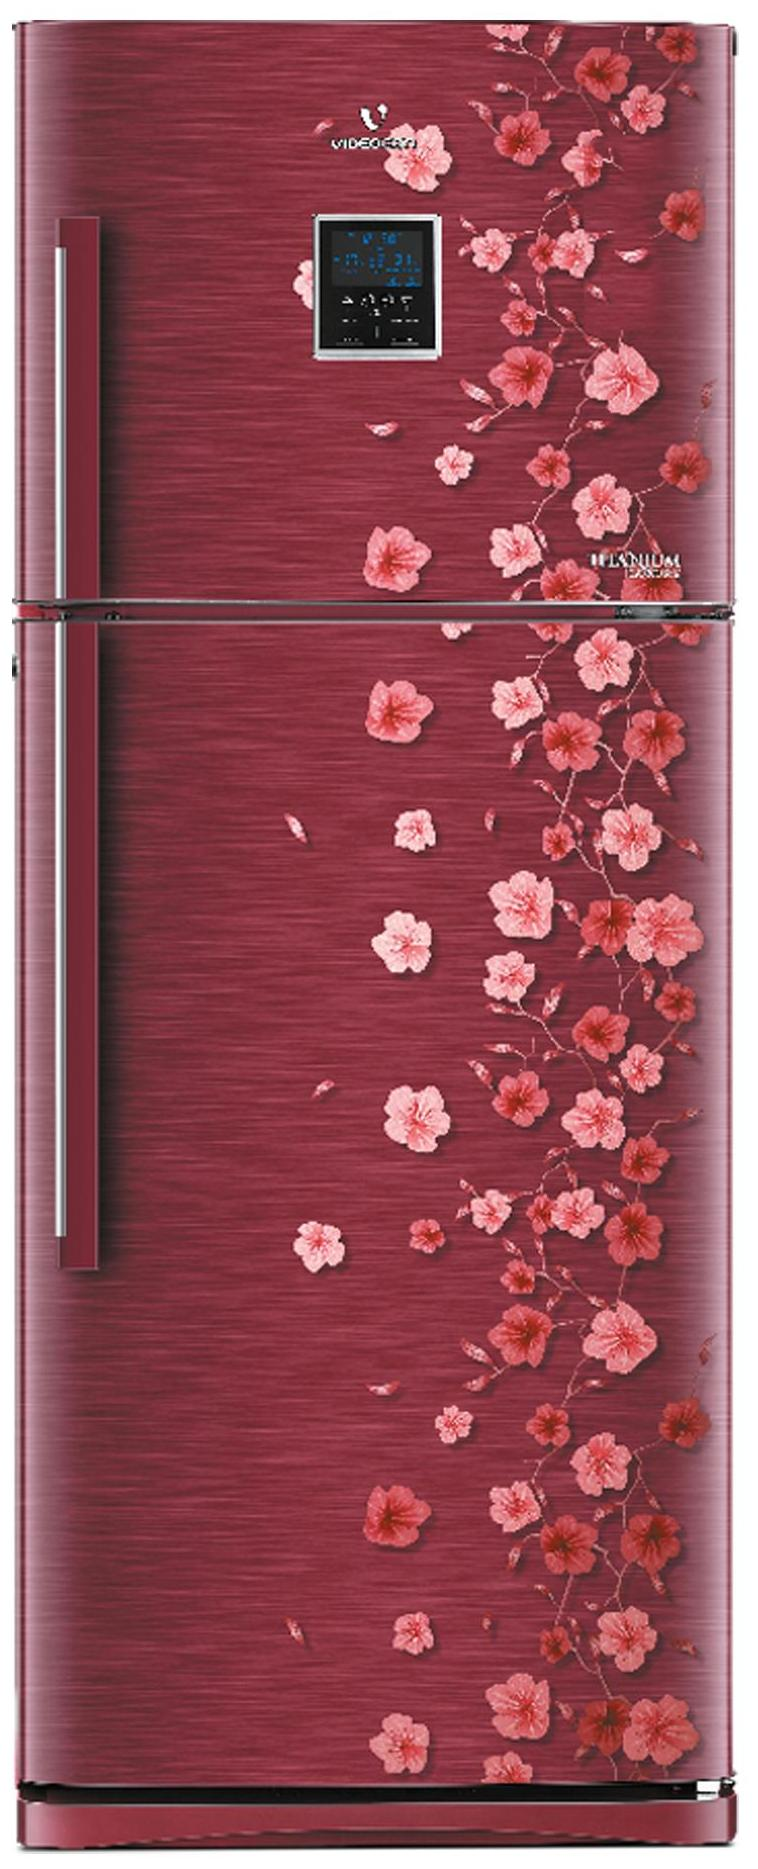 Videocon Frost Free 280 L Double Door Refrigerator (VZ293PECVB-HFK, Scarlet Vine)